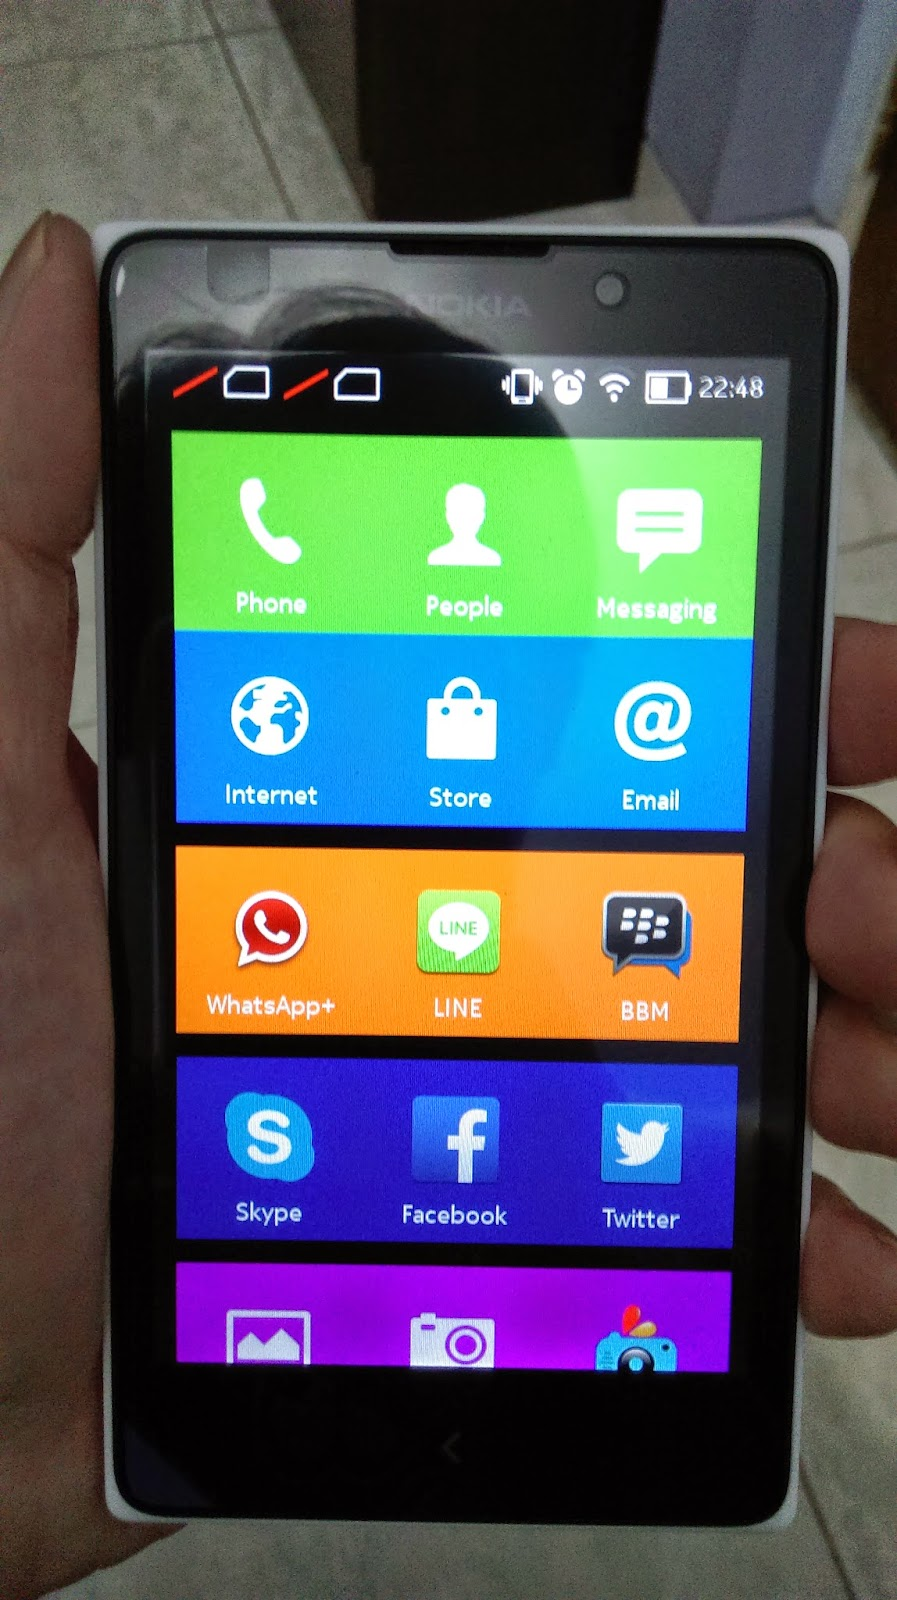 Review Htc Desire 816d Gadget Lg L90 Dual D410 Quadcore Sim 8gb Hitam Bluetooth V30 A2dp Operating System Nokia X Software Platform 11 Berbasis Android 412 Jelly Bean